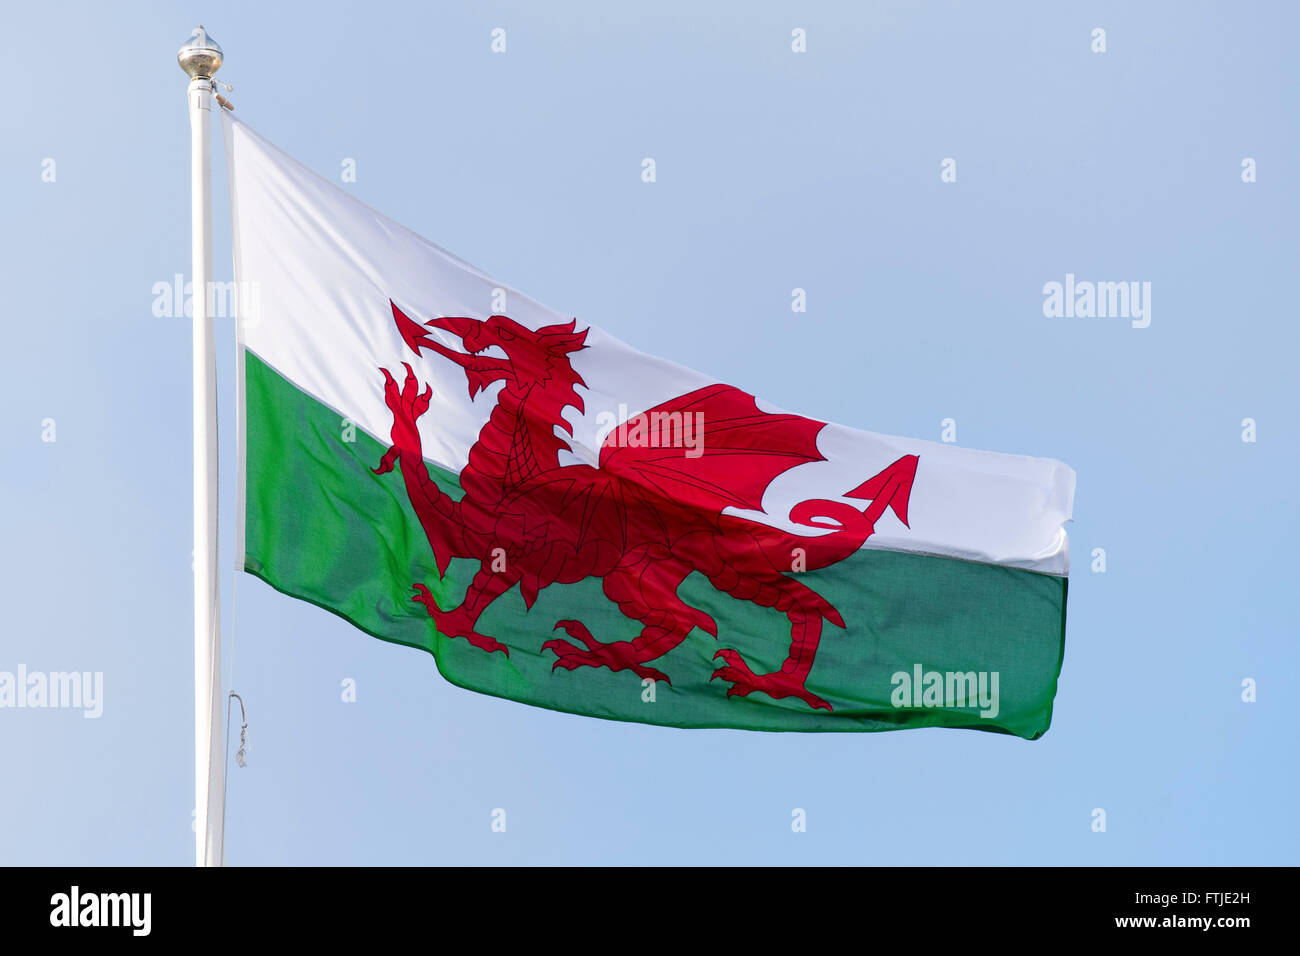 Wales Flag Imágenes De Stock & Wales Flag Fotos De Stock - Alamy